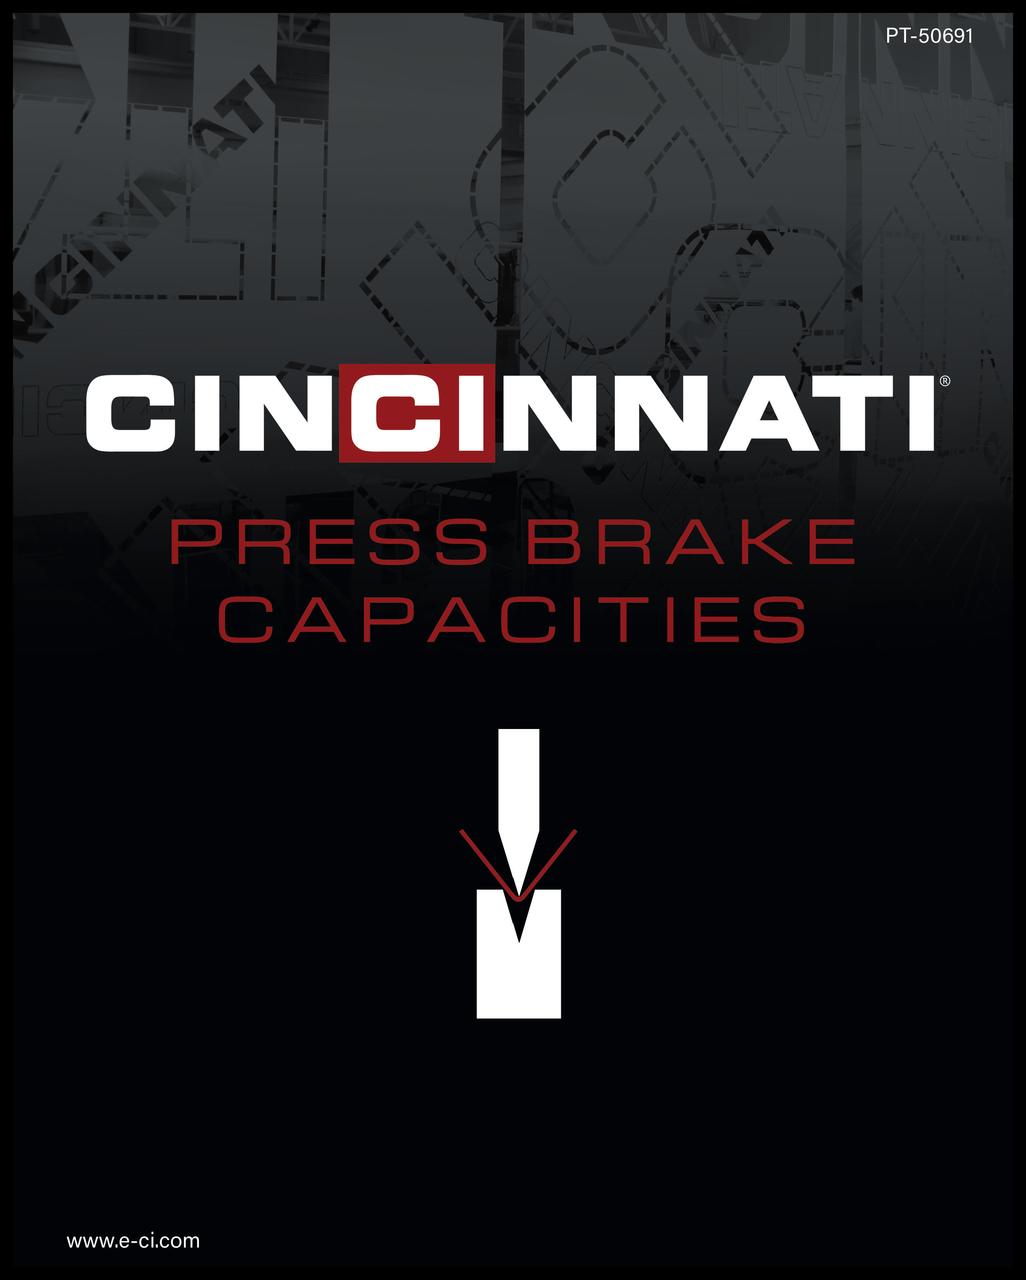 PT-50691 Press Brake Capacities